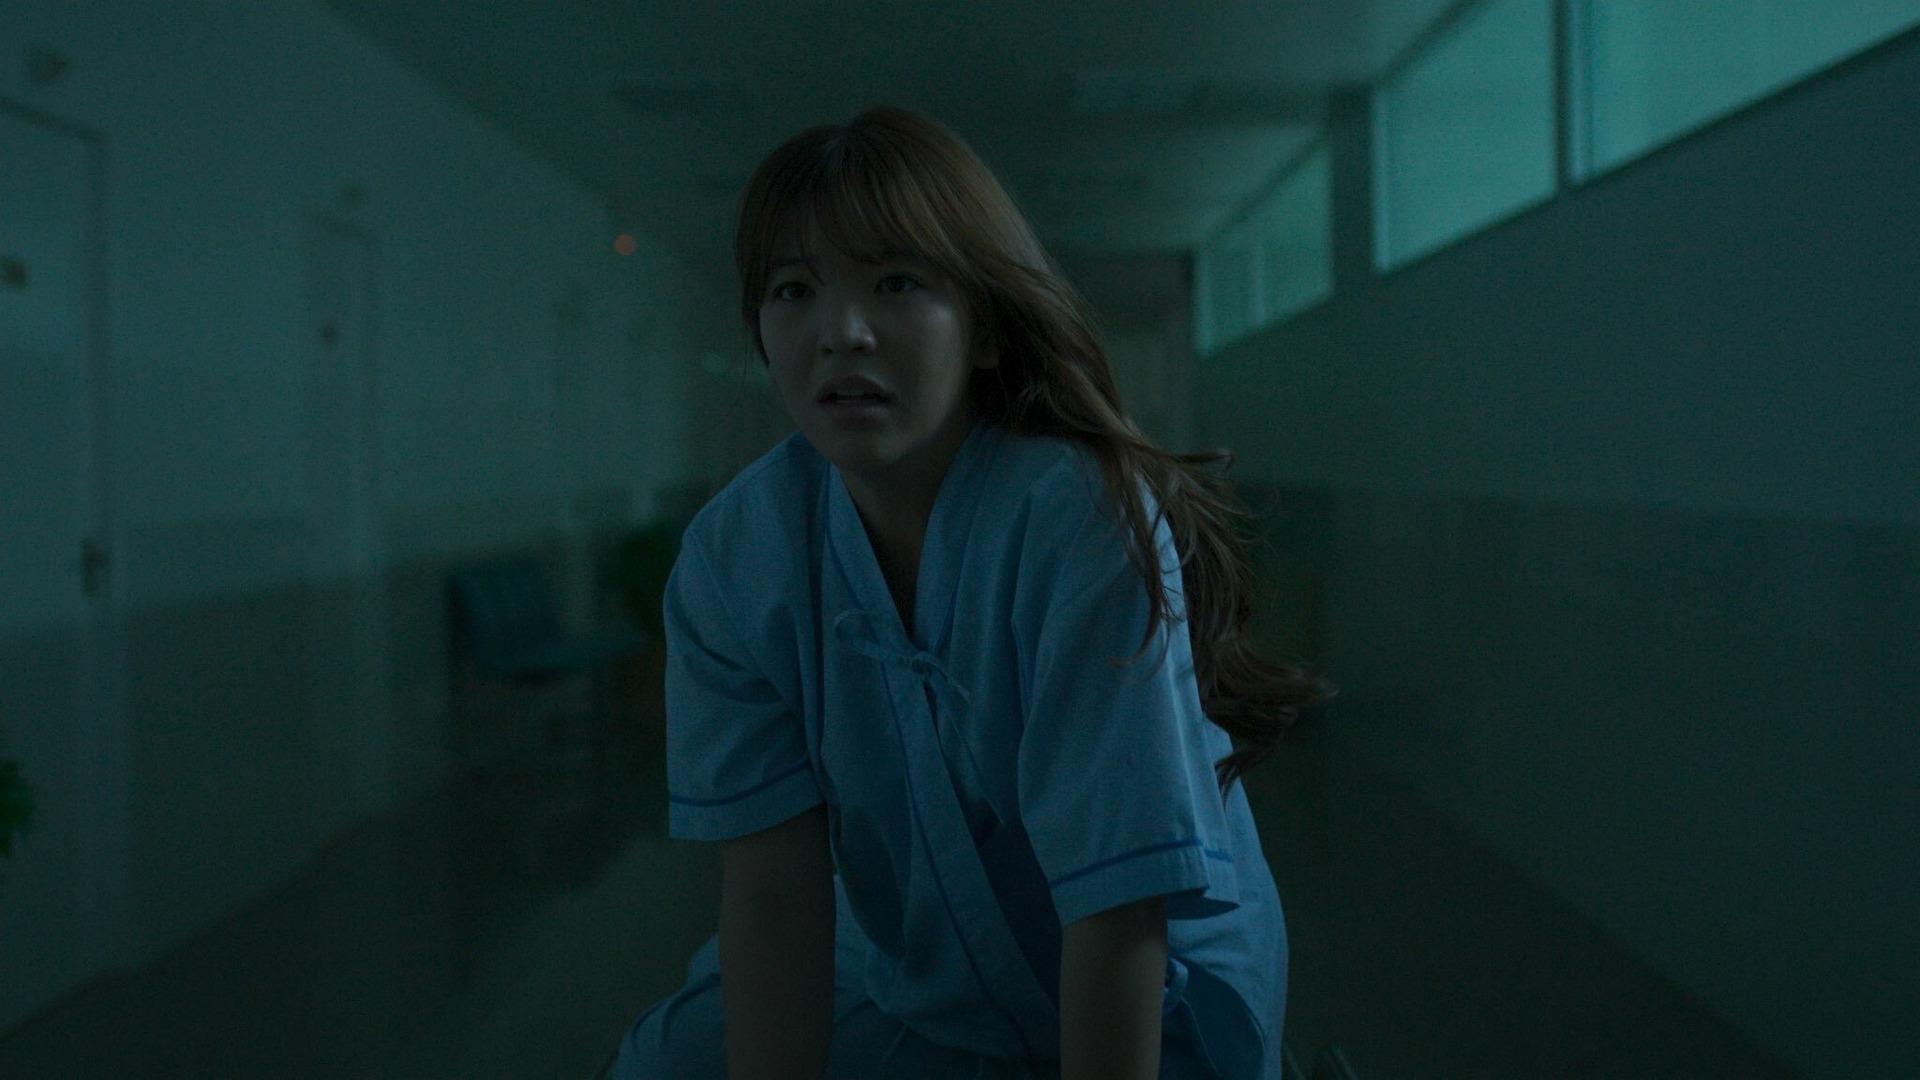 Давай сразимся, призрак! — s01e13 — Episode 13